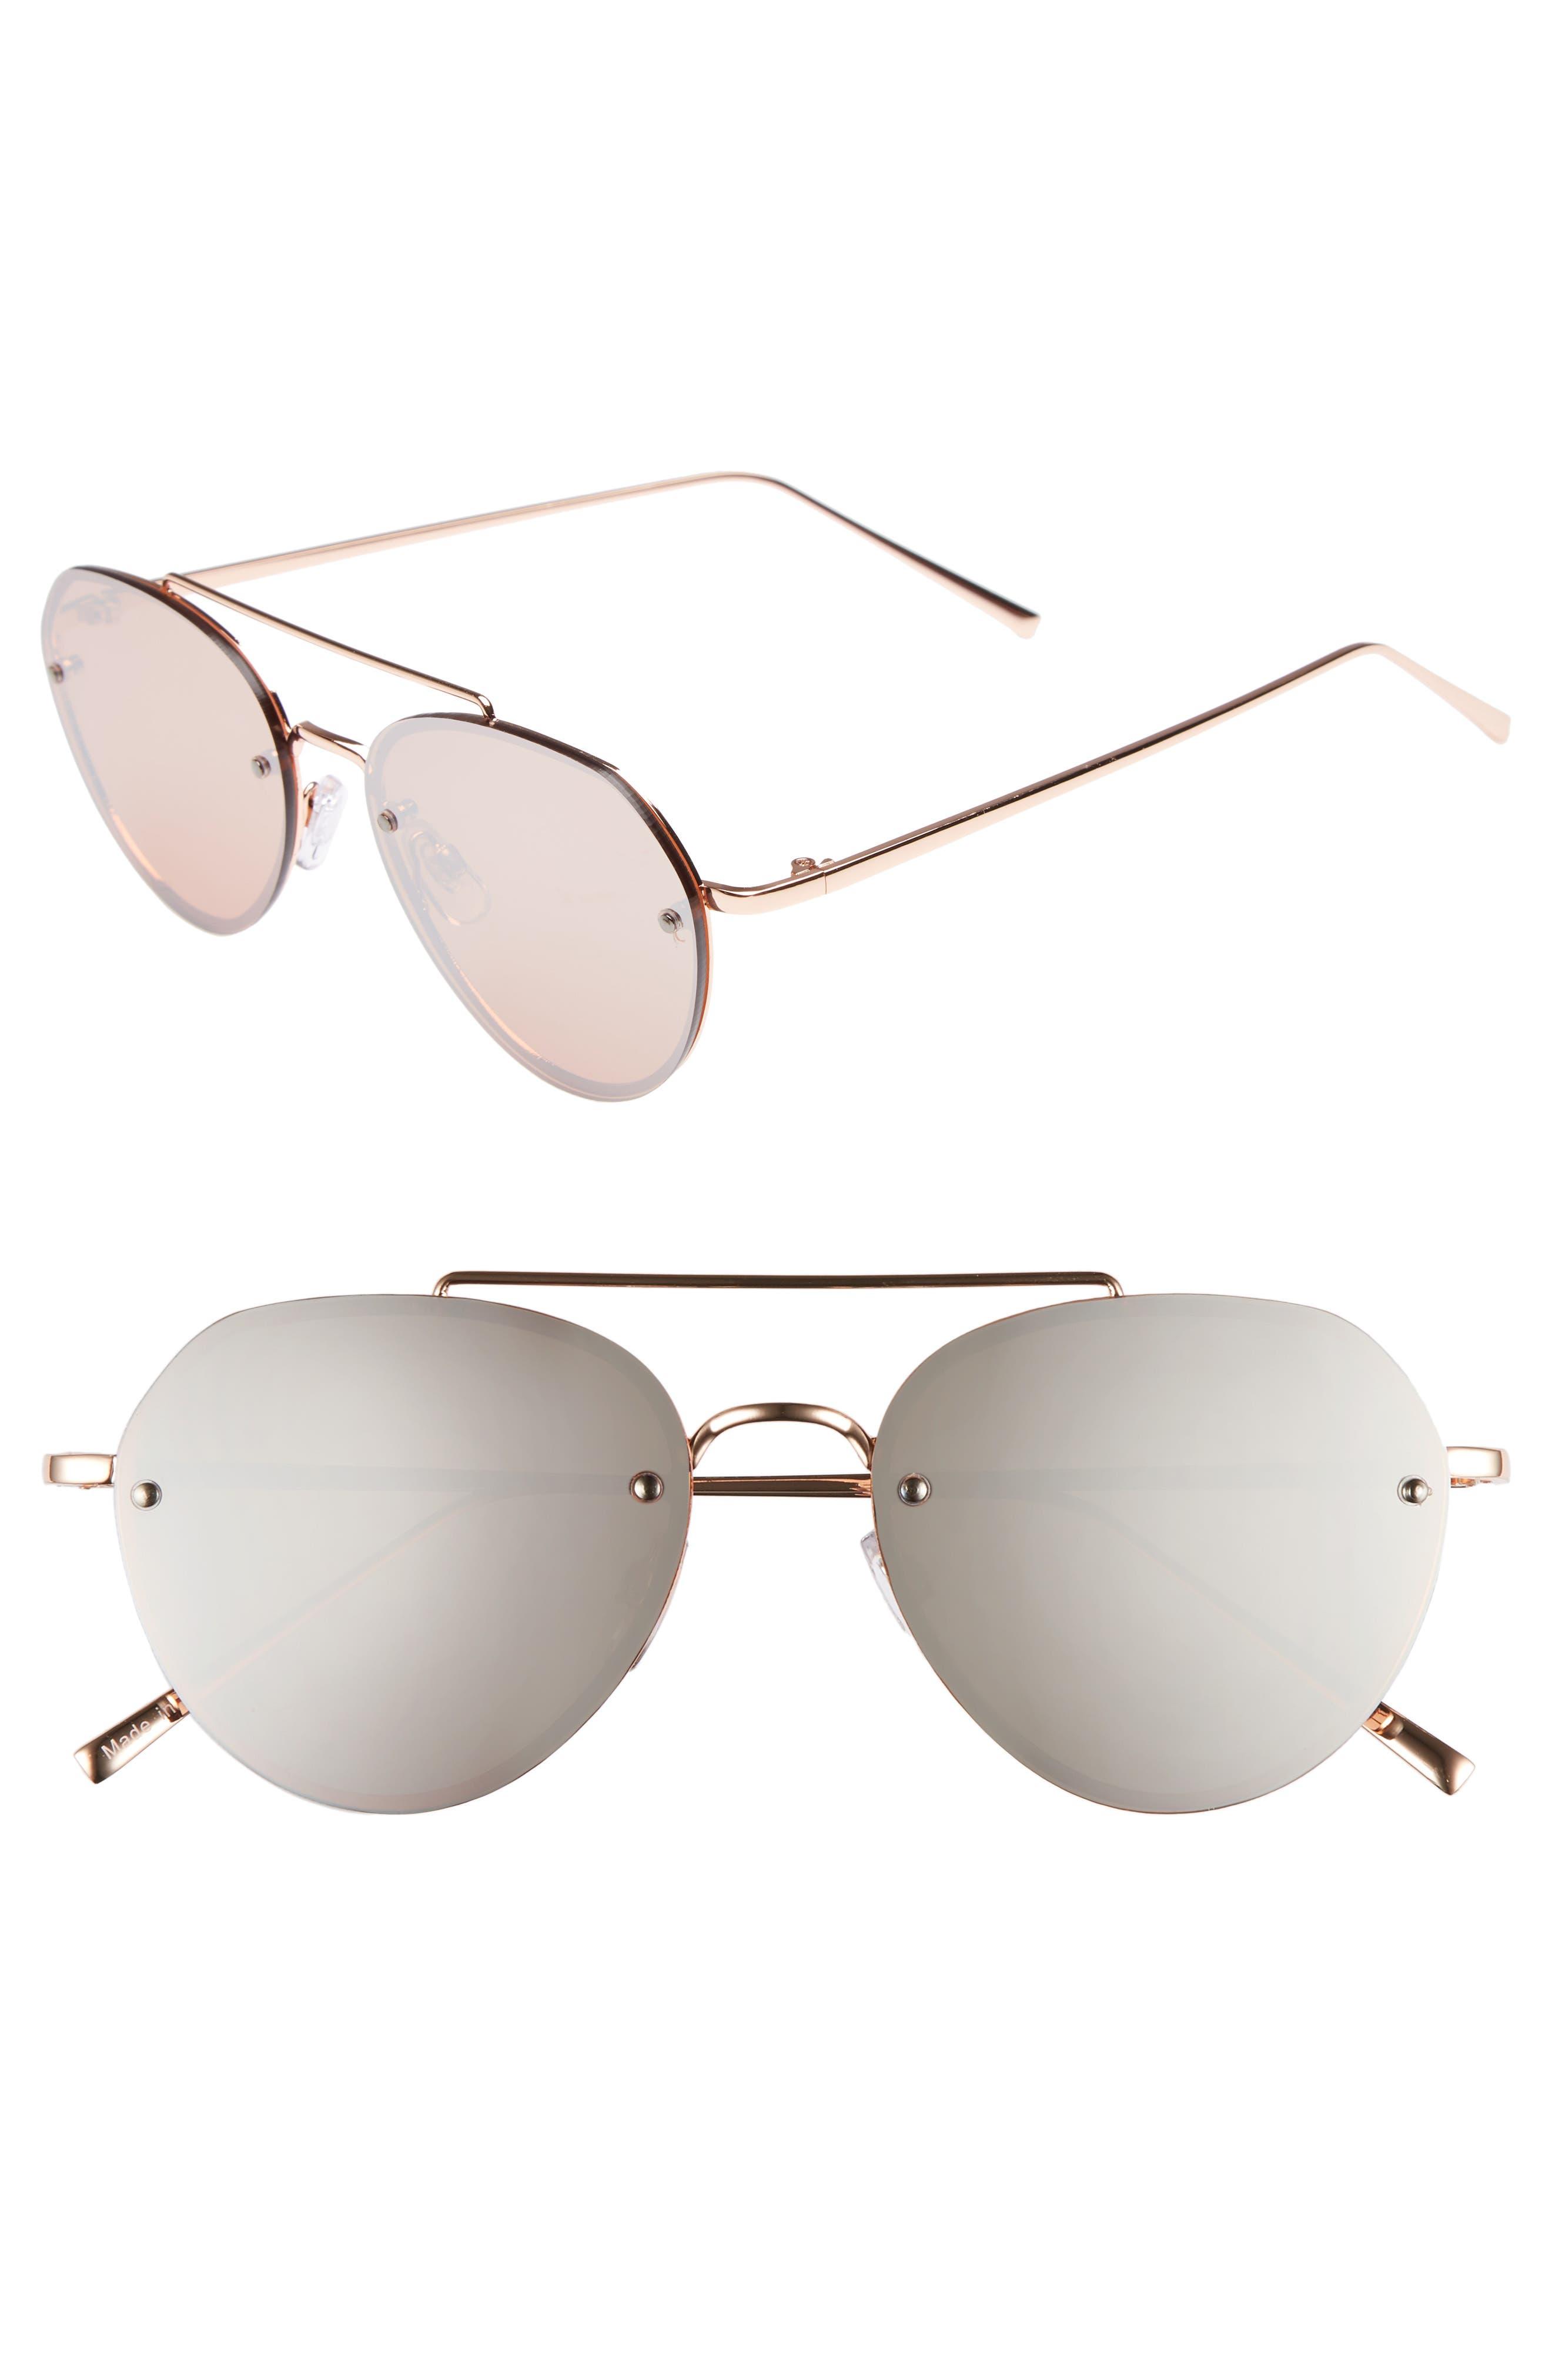 Gradient Petite Aviator Sunglasses,                         Main,                         color, ROSE / GOLD